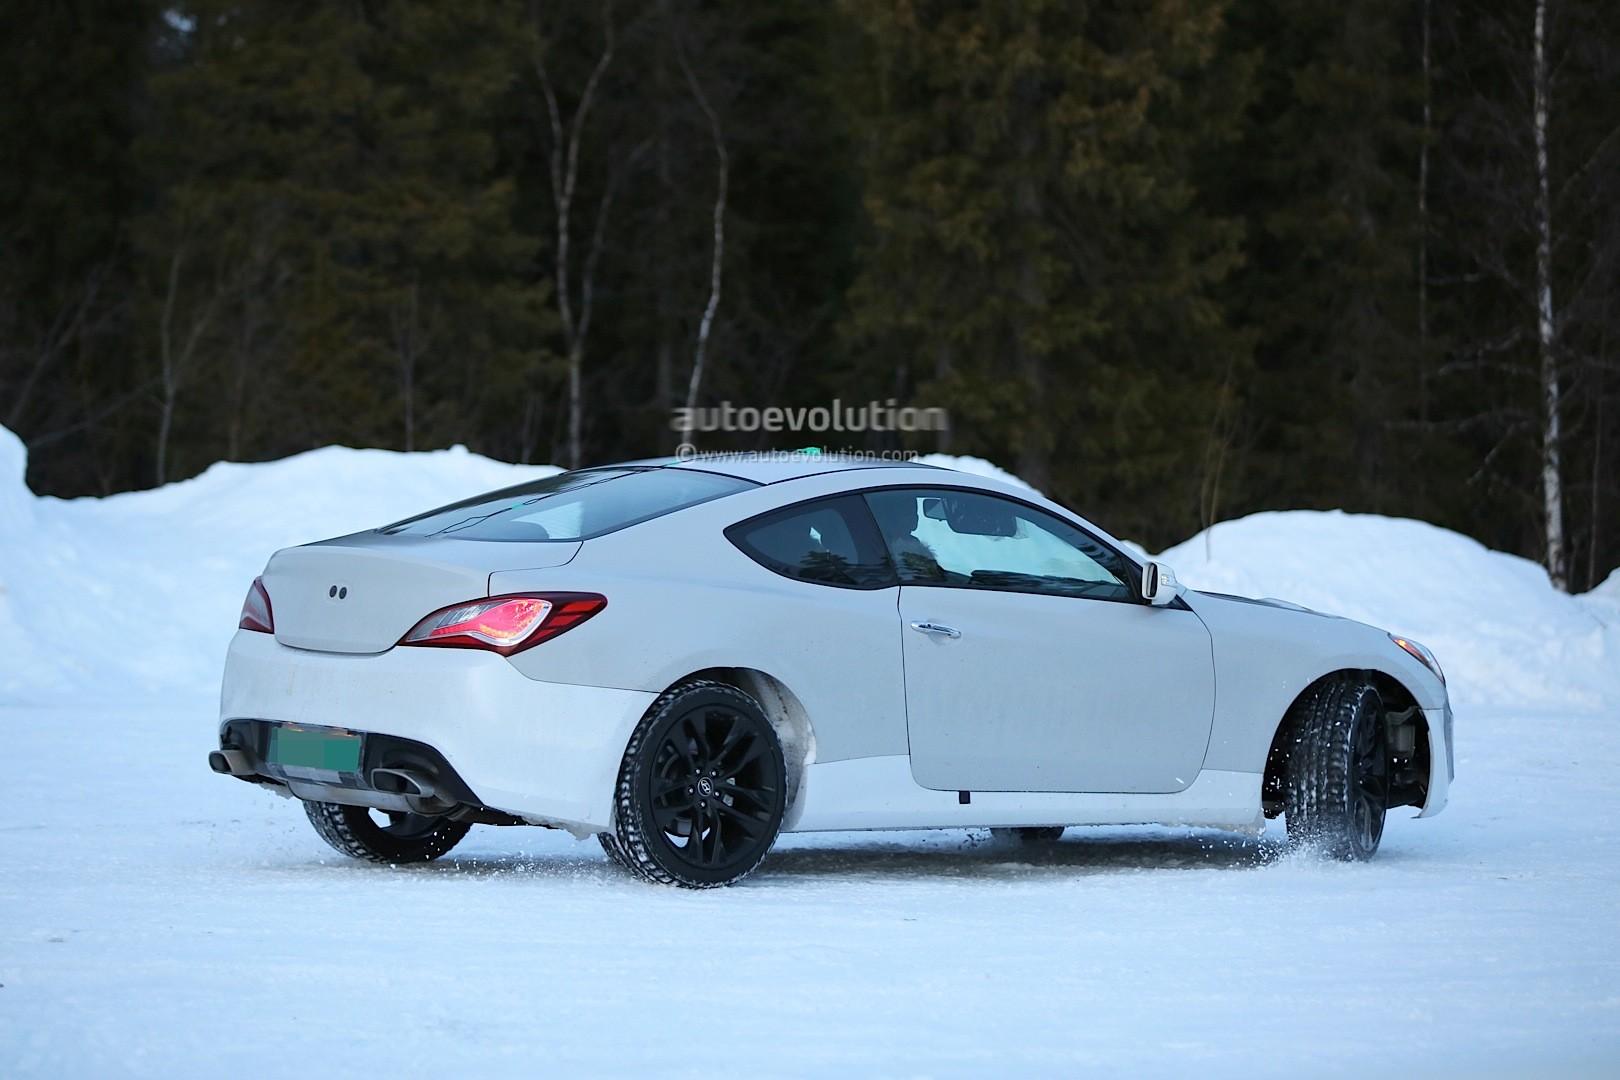 spyshots-2017-hyundai-genesis-coupe-mule-starts-winter-testing-is-expected-to-get-v8_12.jpg